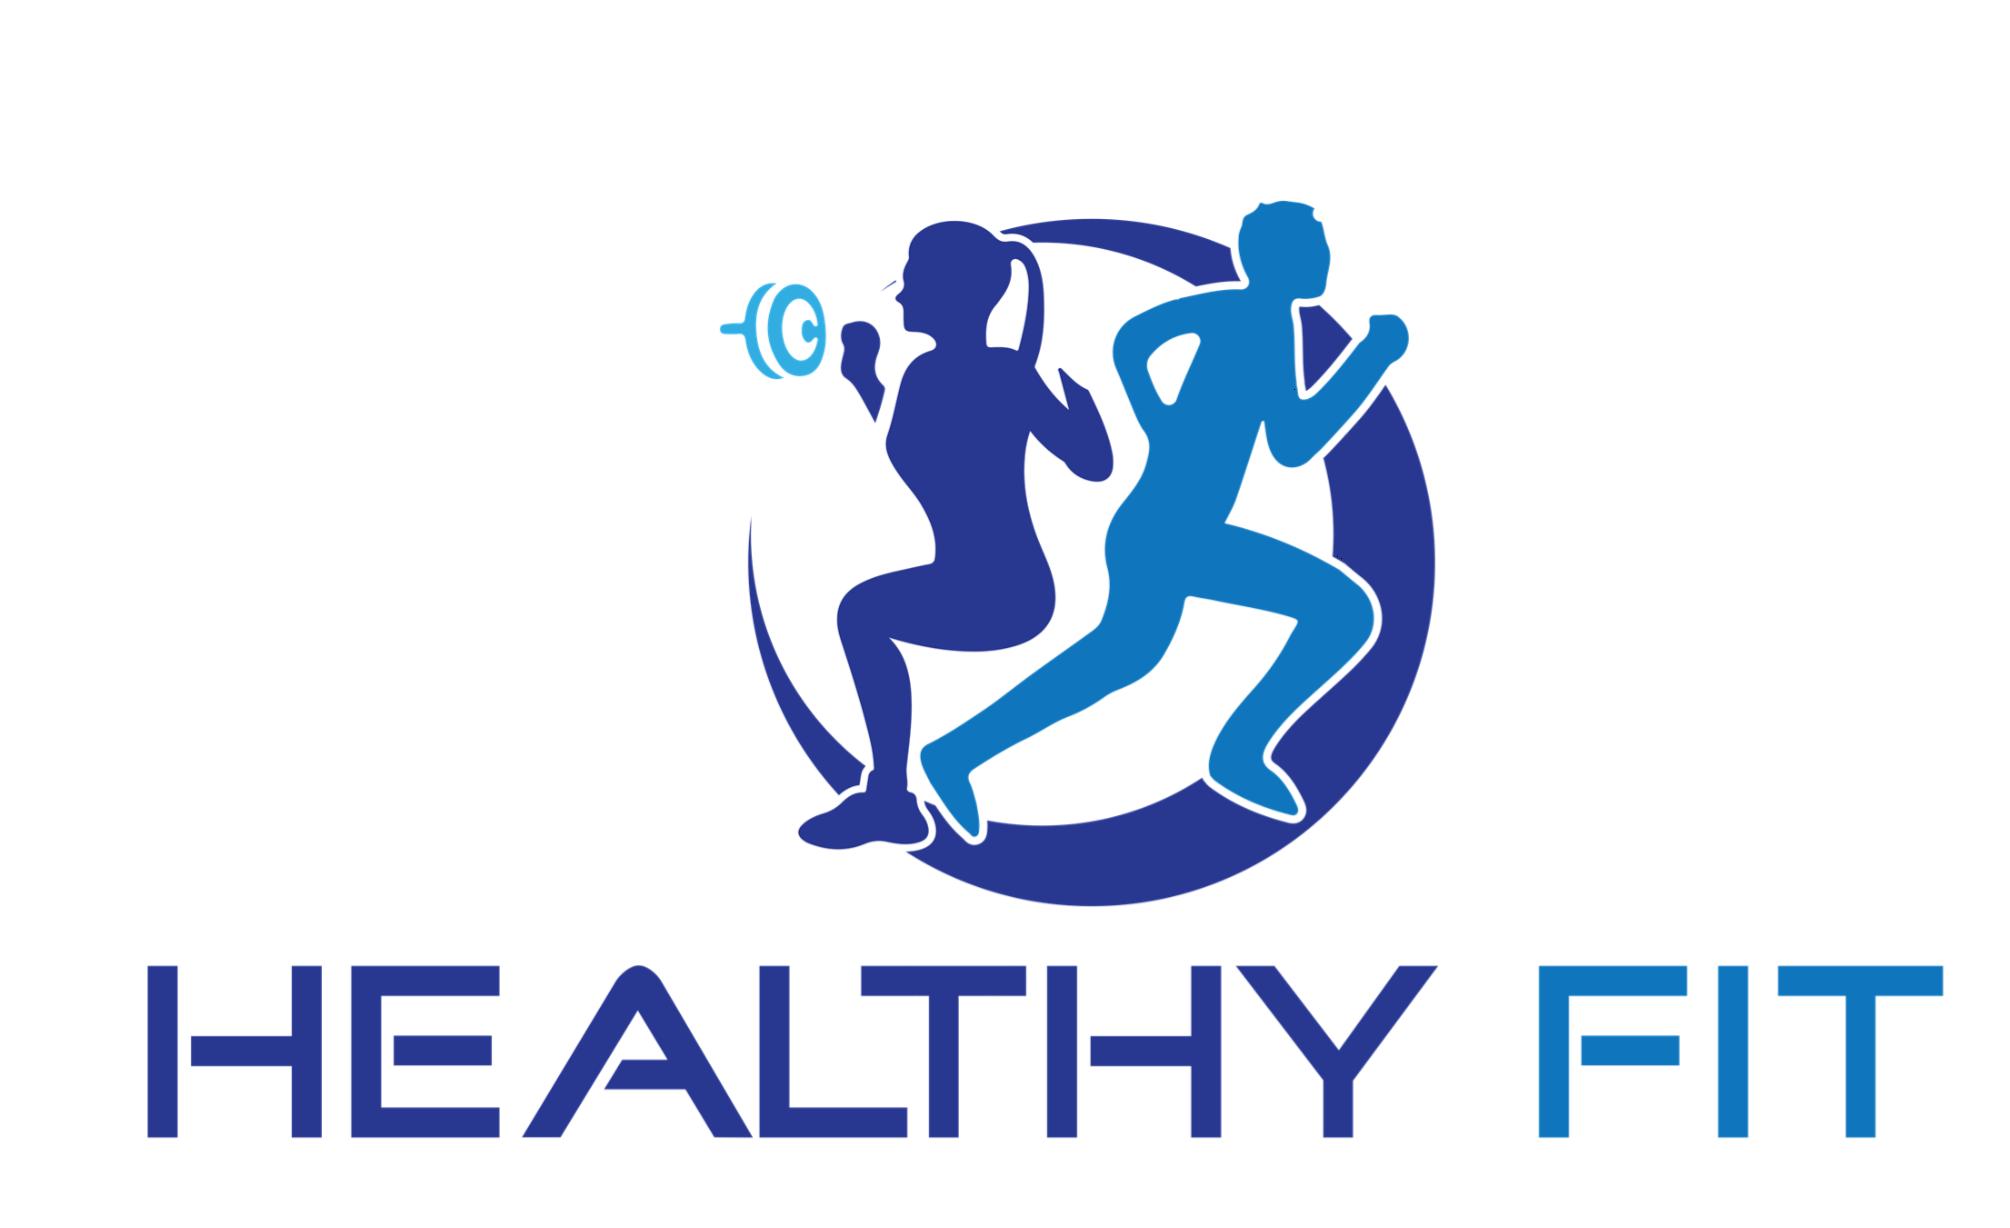 Healthy Fit no tagline_edited